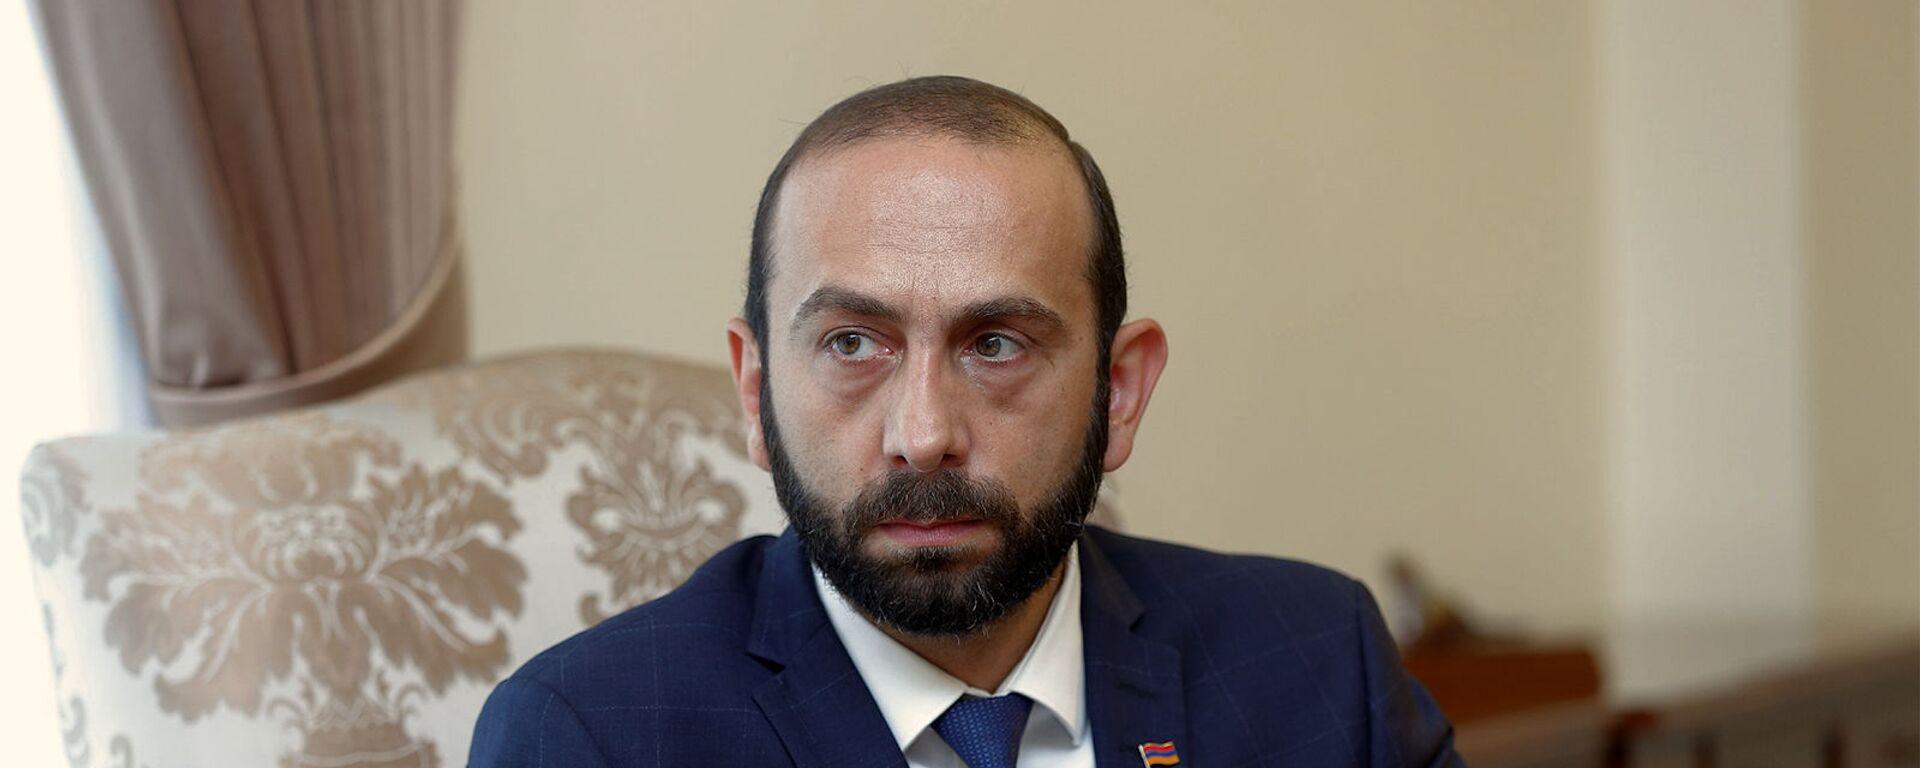 Министр иностранных дел Арарат Мирзоян - Sputnik Արմենիա, 1920, 25.09.2021